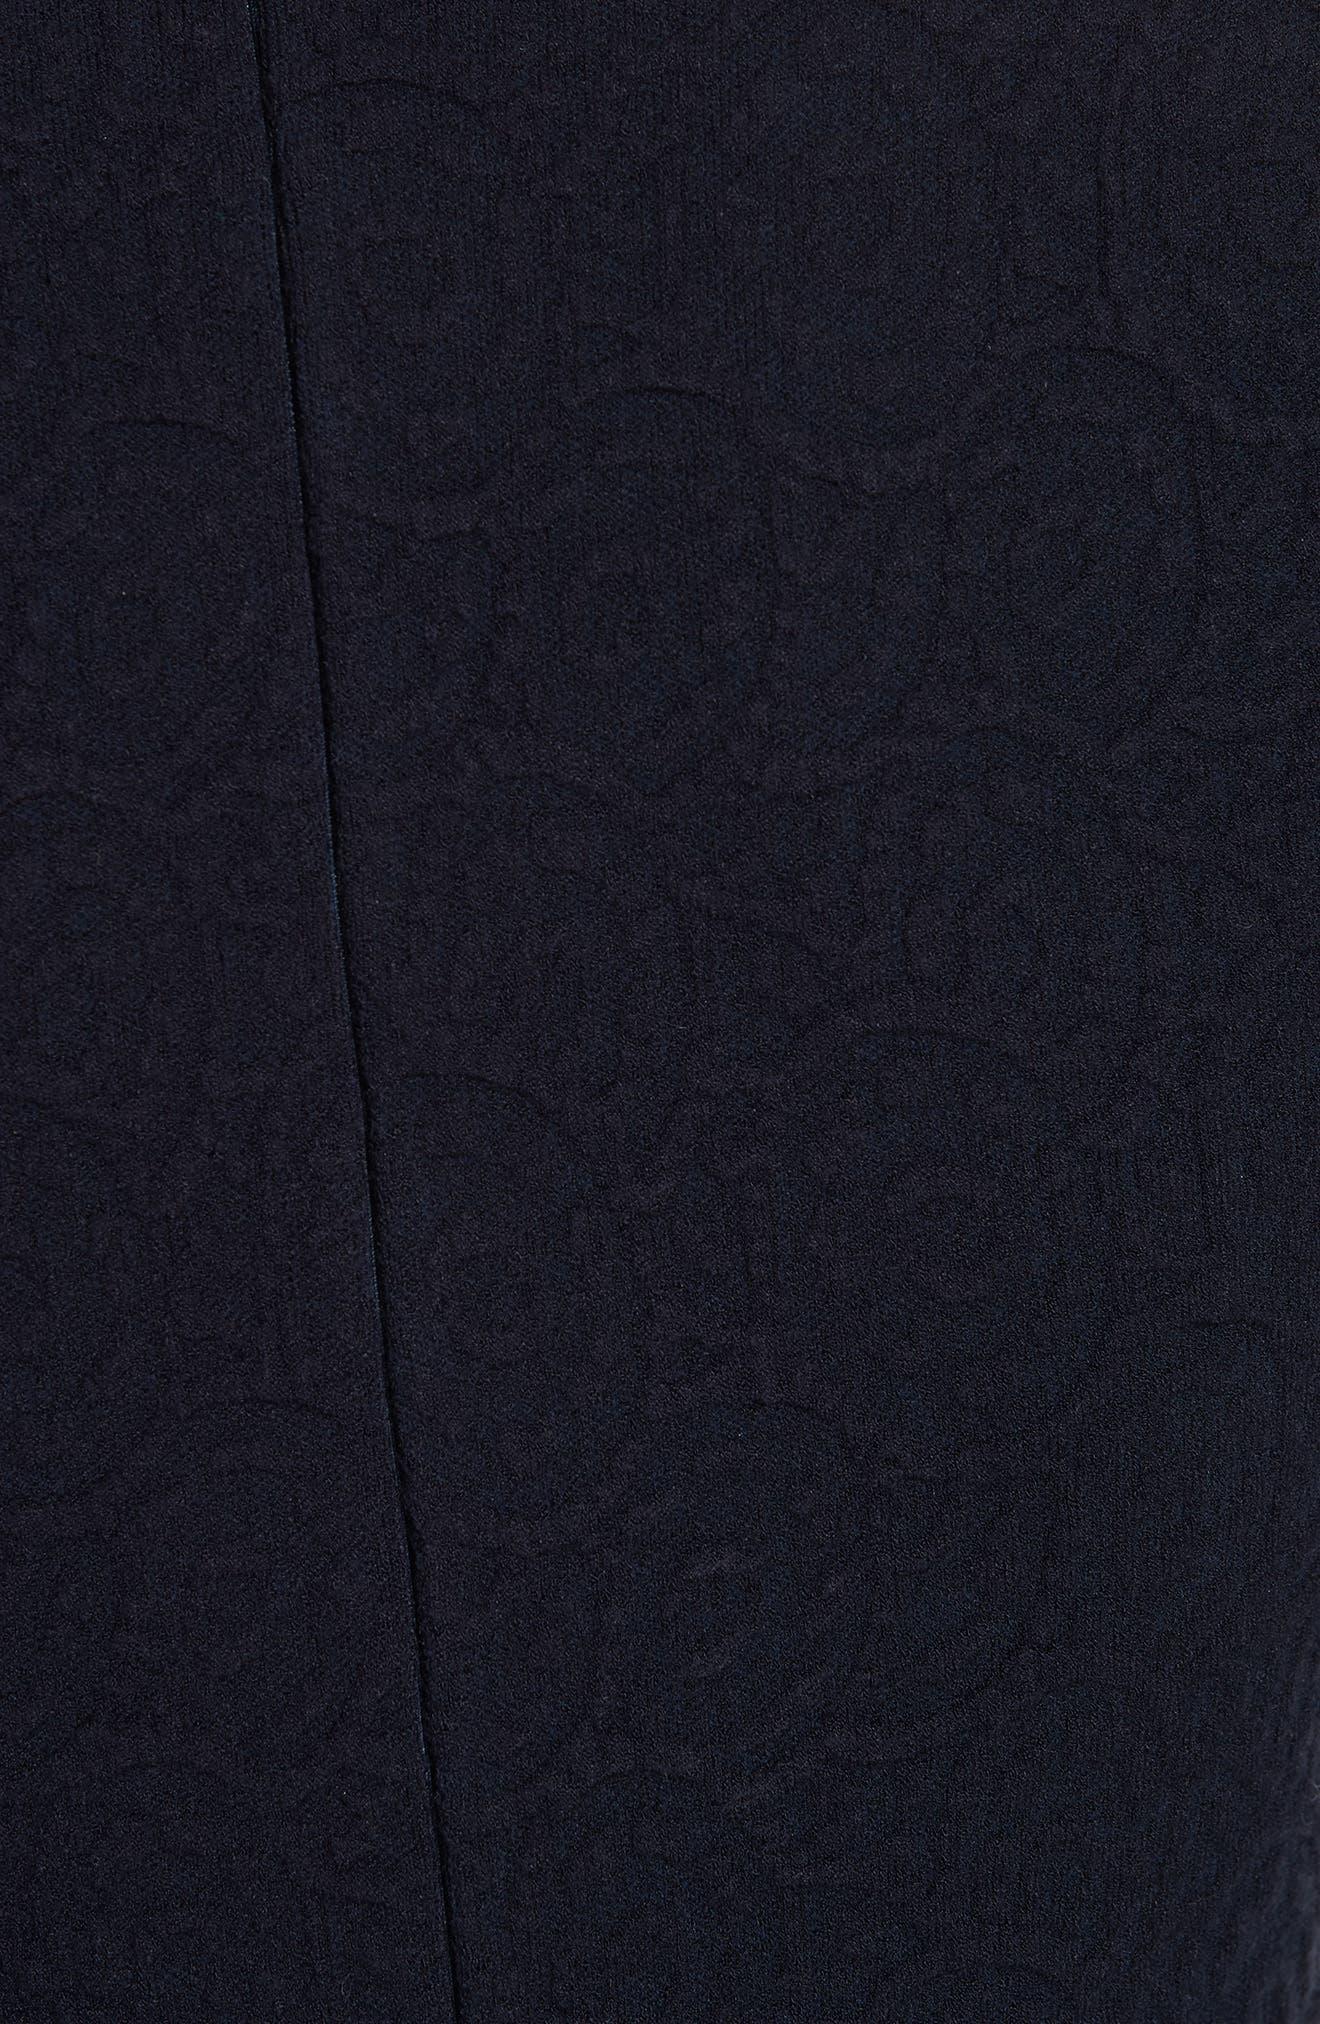 Textured Jacquard Knit Fit & Flare Dress,                             Alternate thumbnail 6, color,                             NAVY